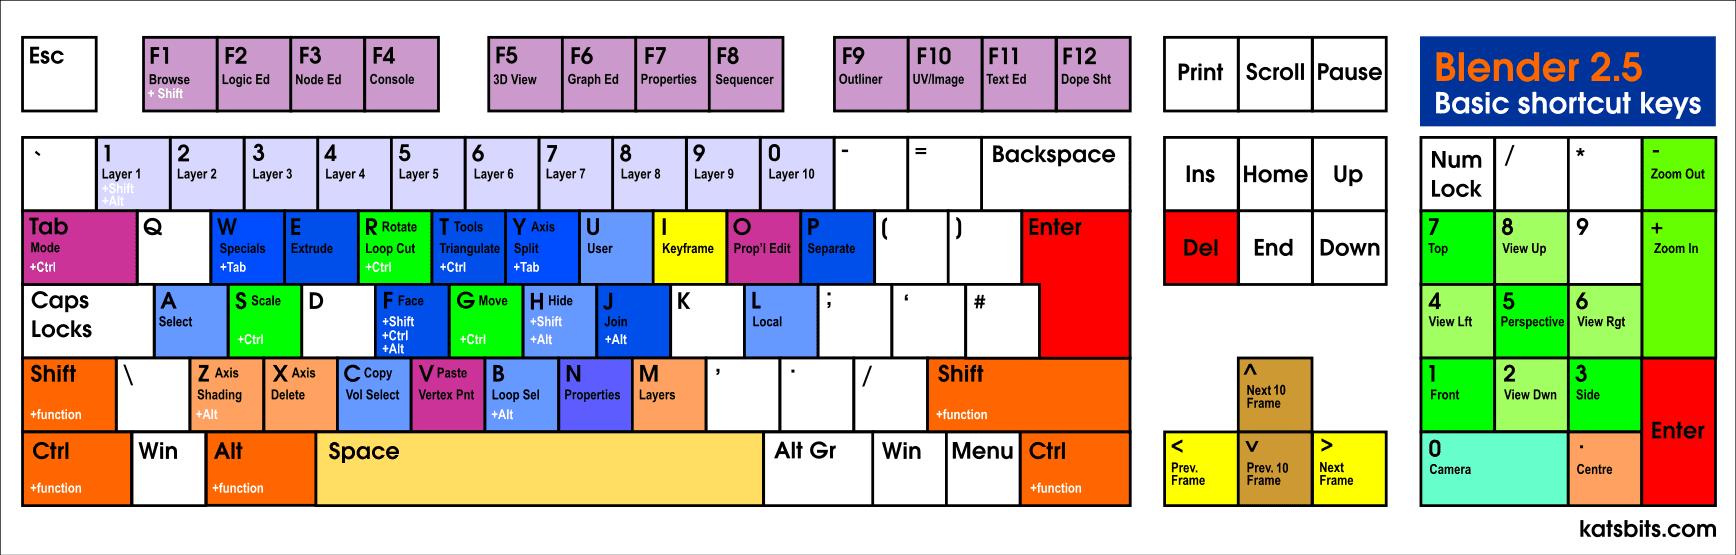 Blender_2.5_Keyboard-layout